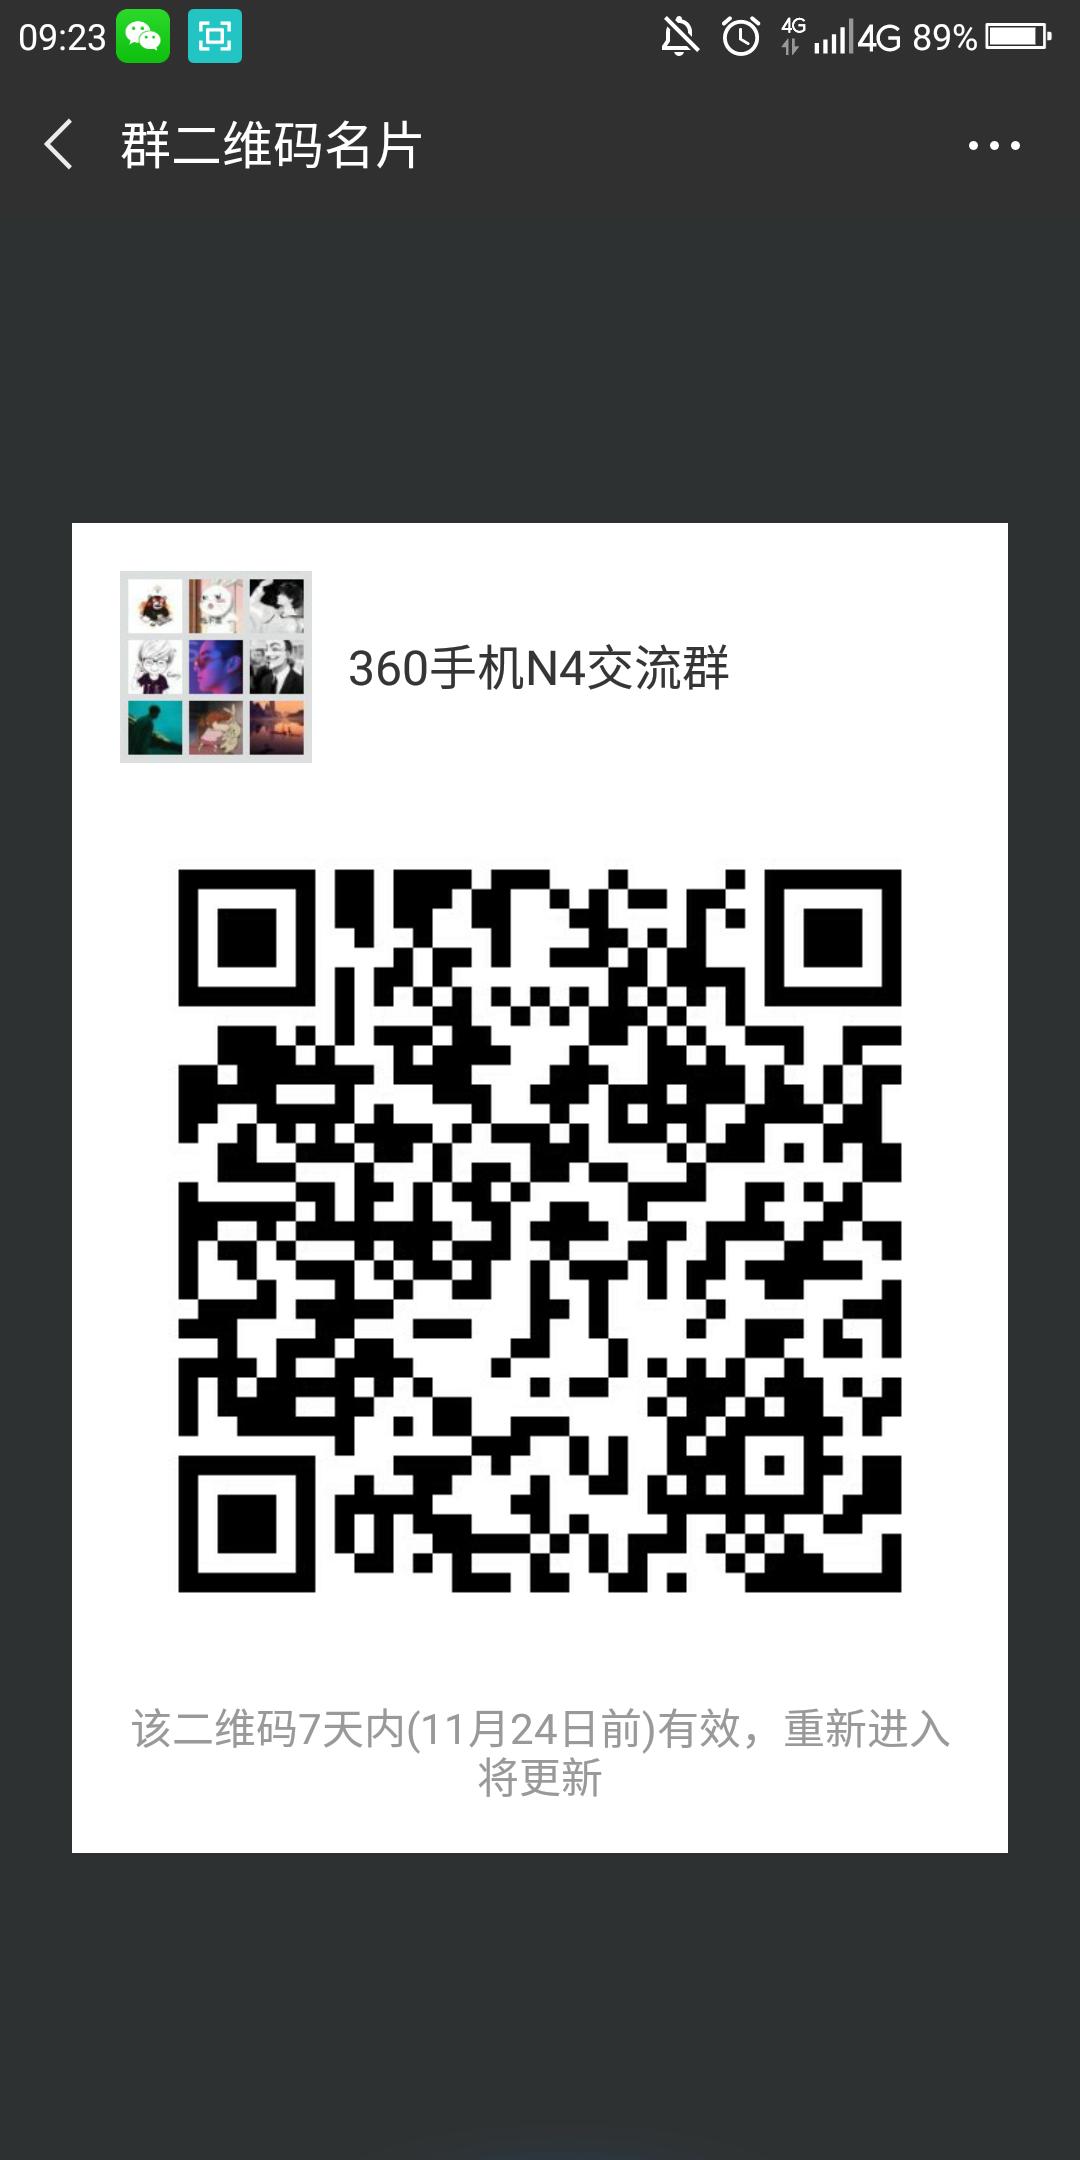 Screenshot_2018-11-17-09-23-04.png